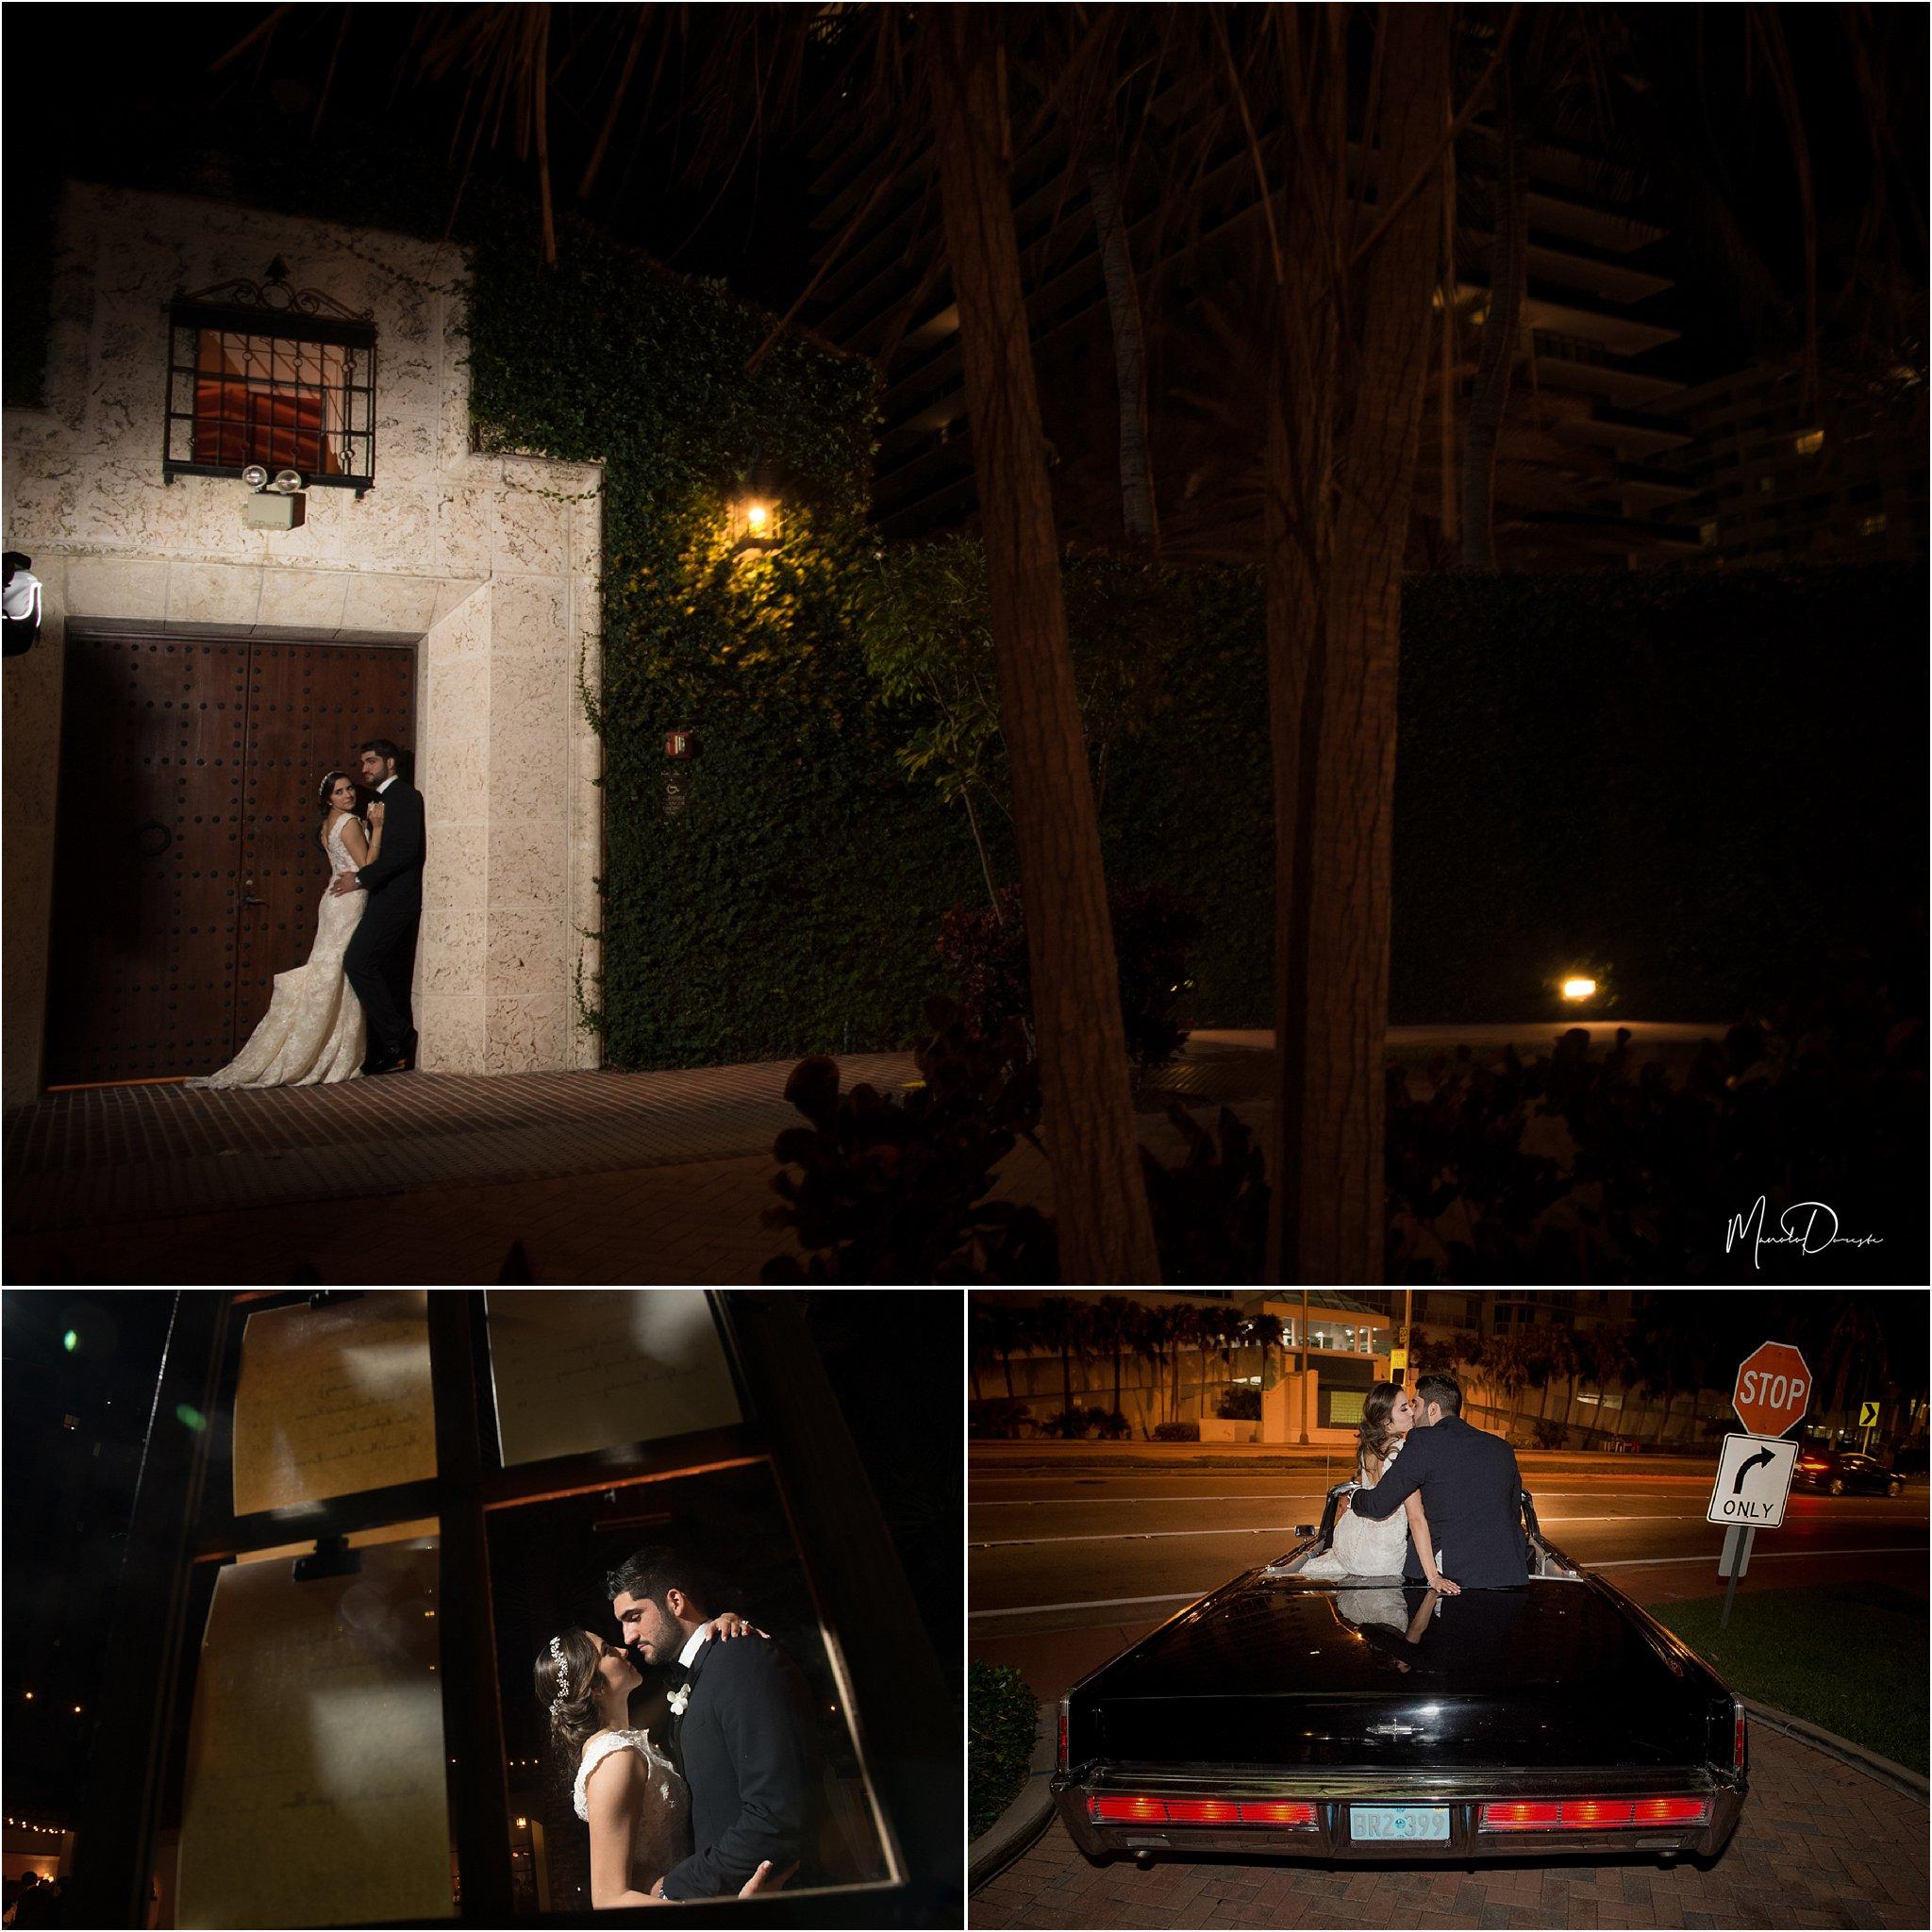 00951_ManoloDoreste_InFocusStudios_Wedding_Family_Photography_Miami_MiamiPhotographer.jpg